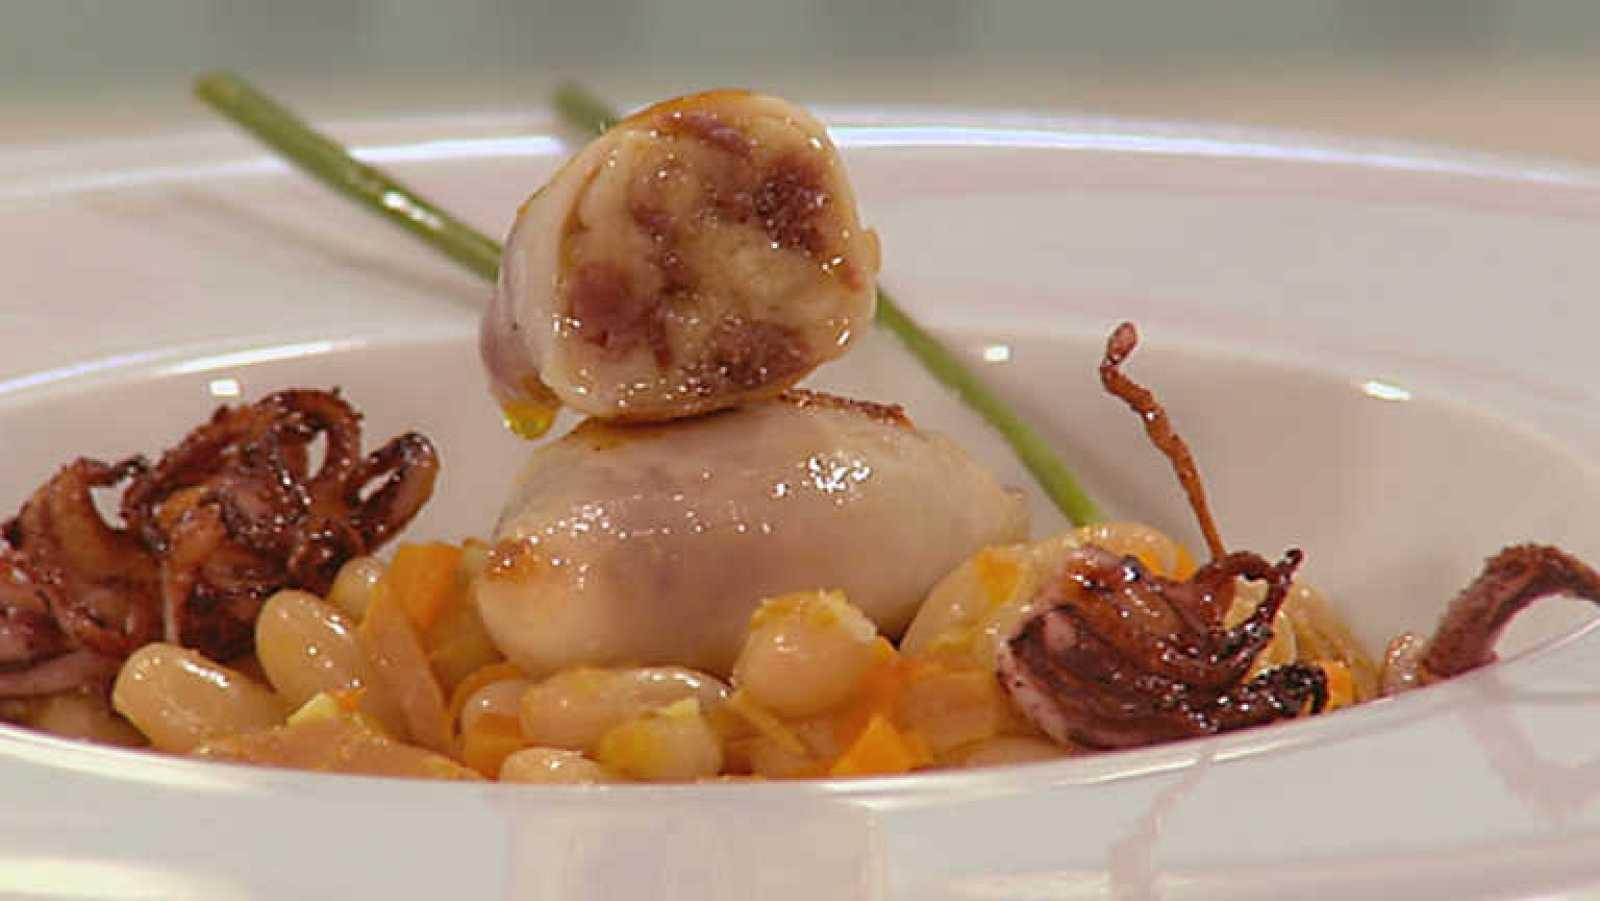 Cocina con sergio chipirones con alubias - Cocina con sergio pepa ...